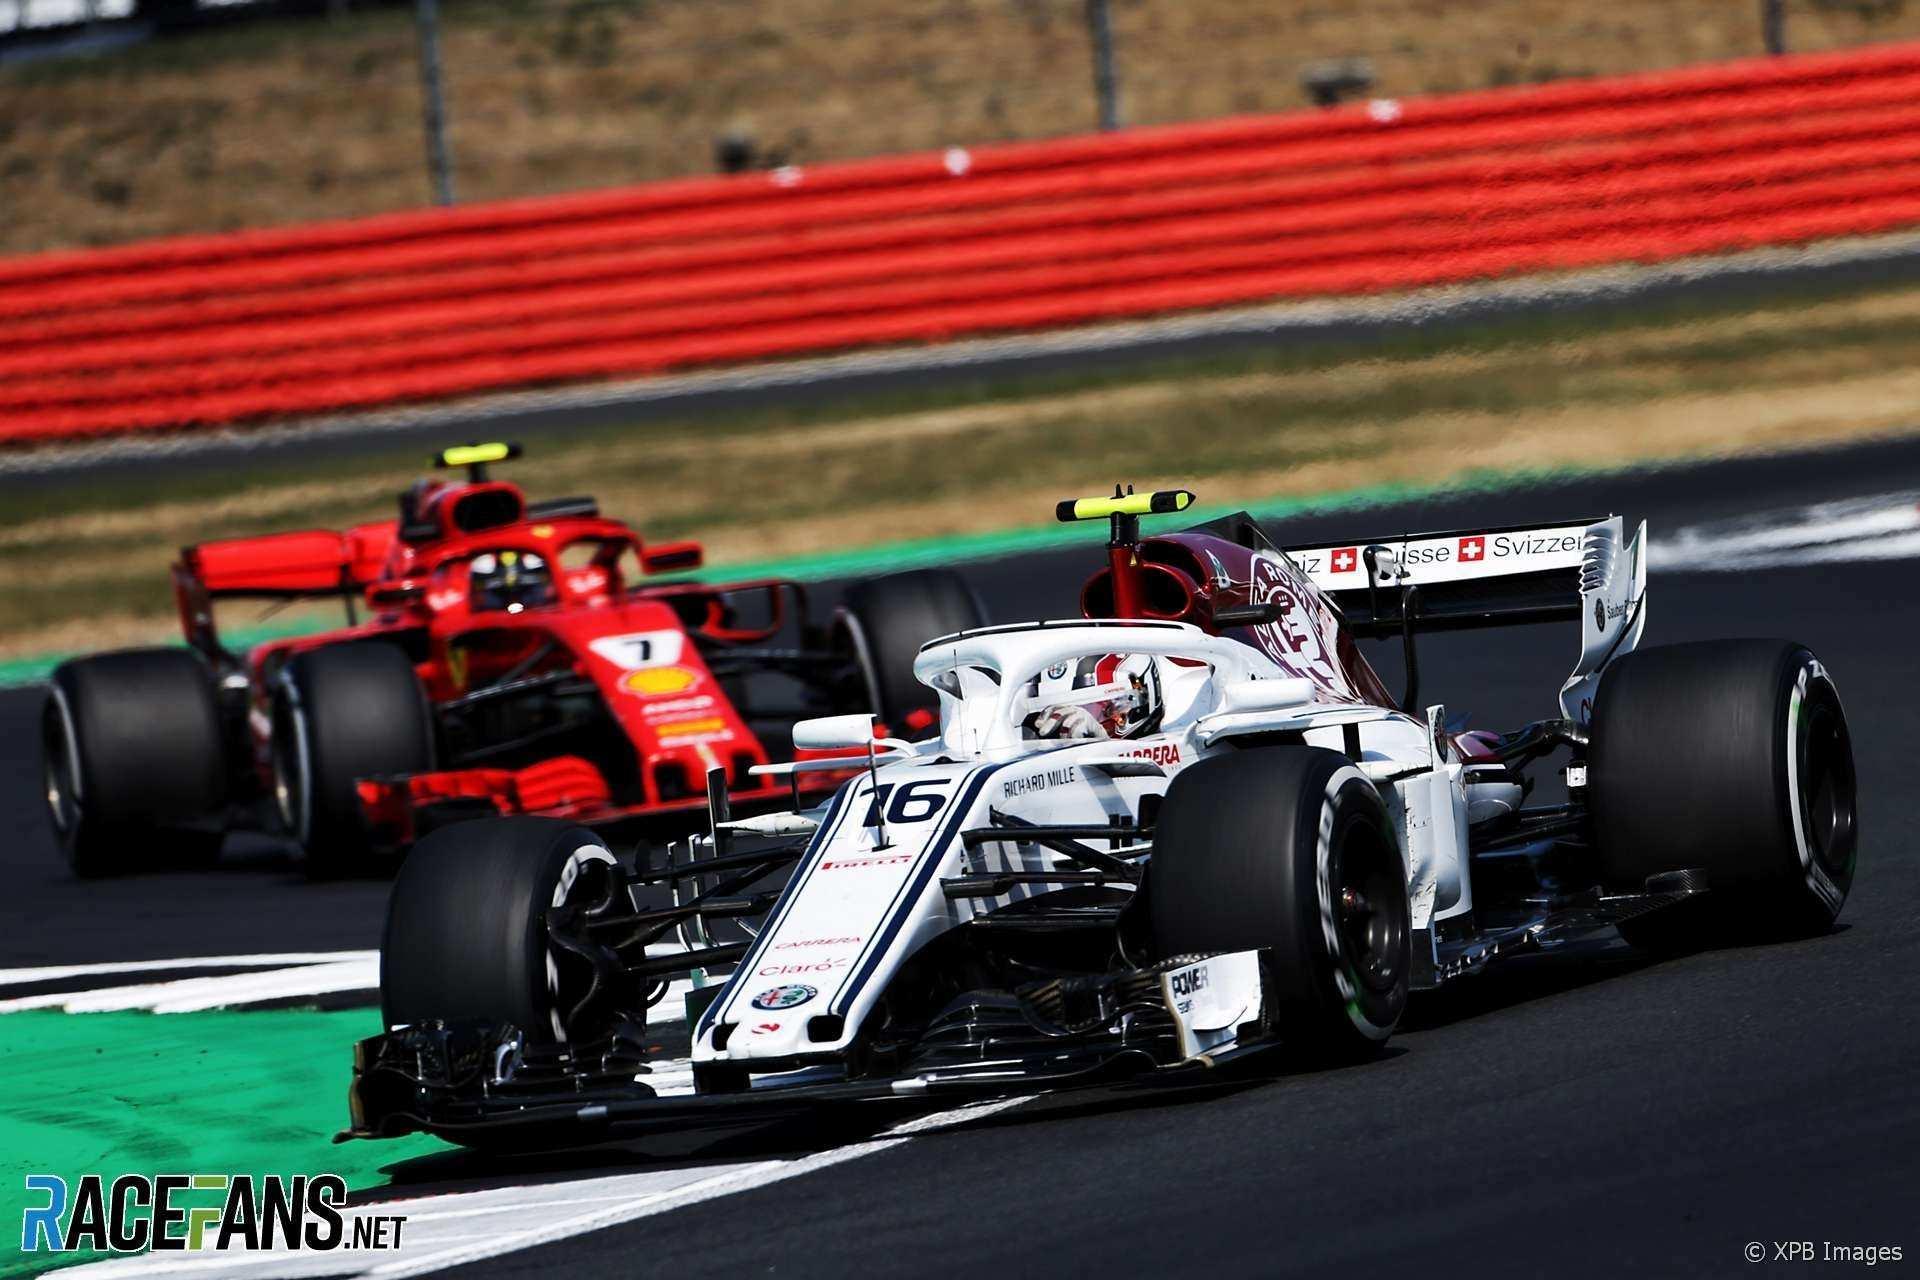 97 New Best Ferrari Leclerc 2019 Specs And Review Speed Test with Best Ferrari Leclerc 2019 Specs And Review